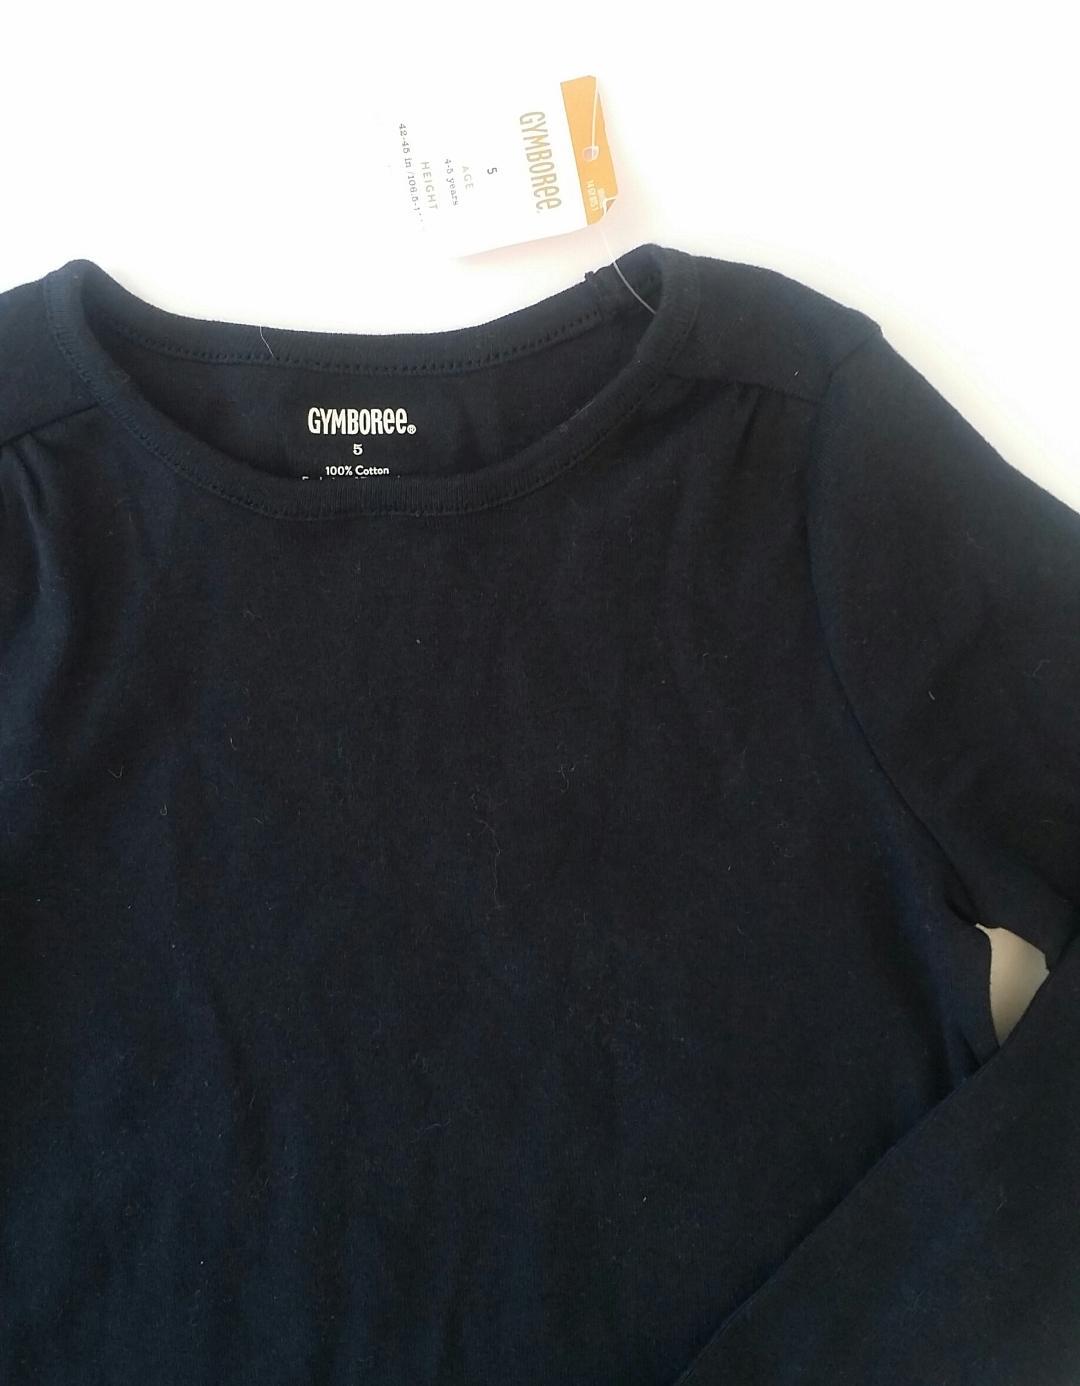 Gymboree-5-YEARS-Long-sleeve-T-Shirt_1952746B.jpg